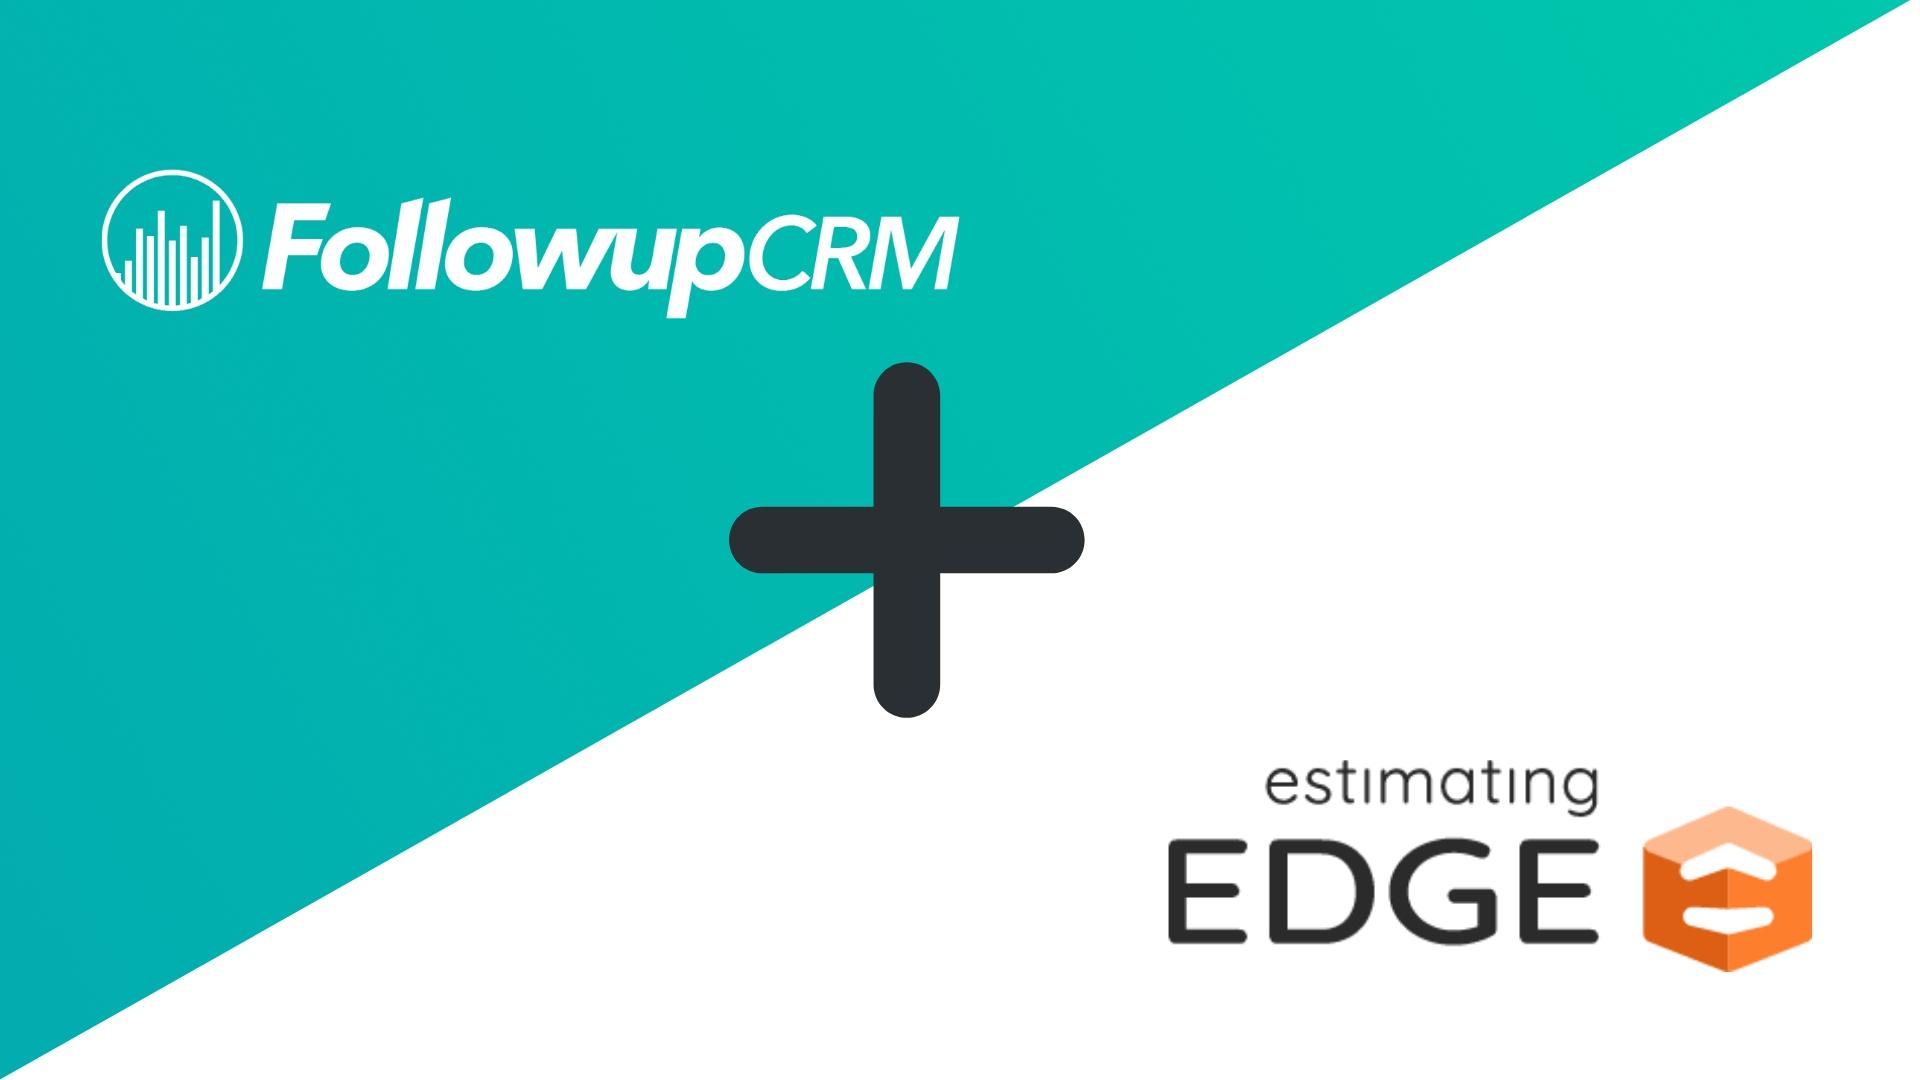 The Estimating edge integration